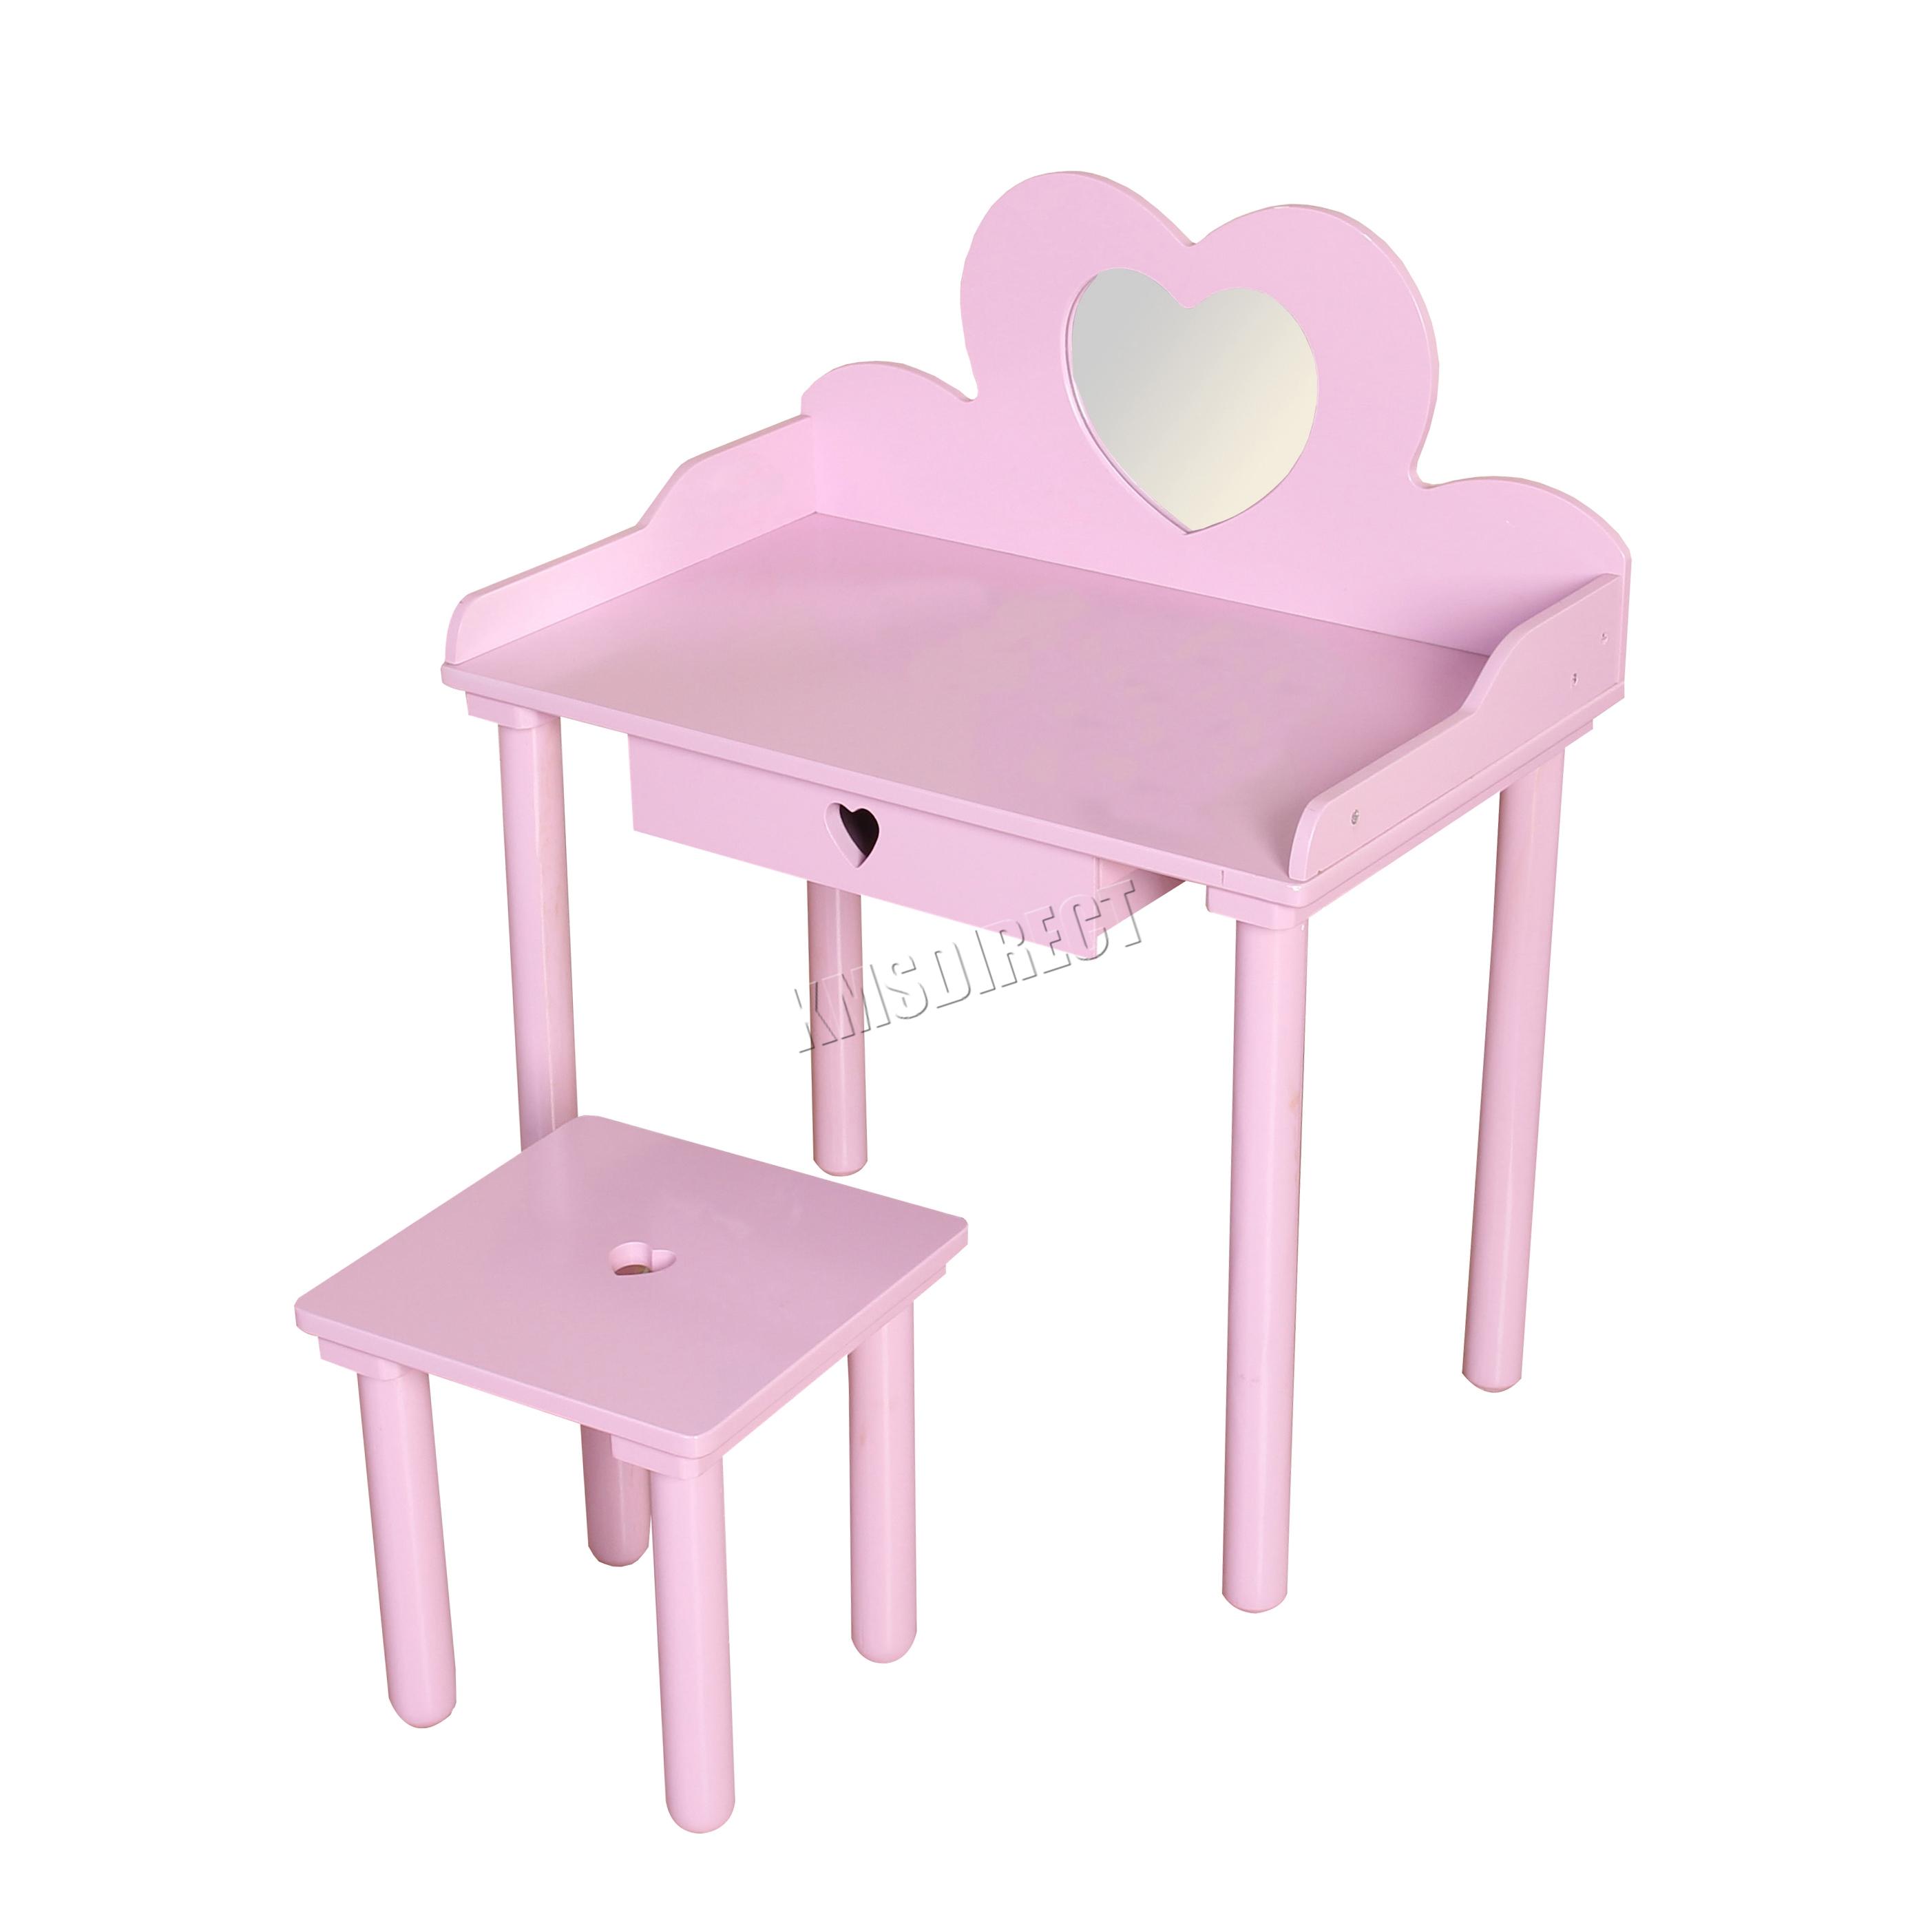 Foxhunter Kids S Dressing Table Chair Set Makeup